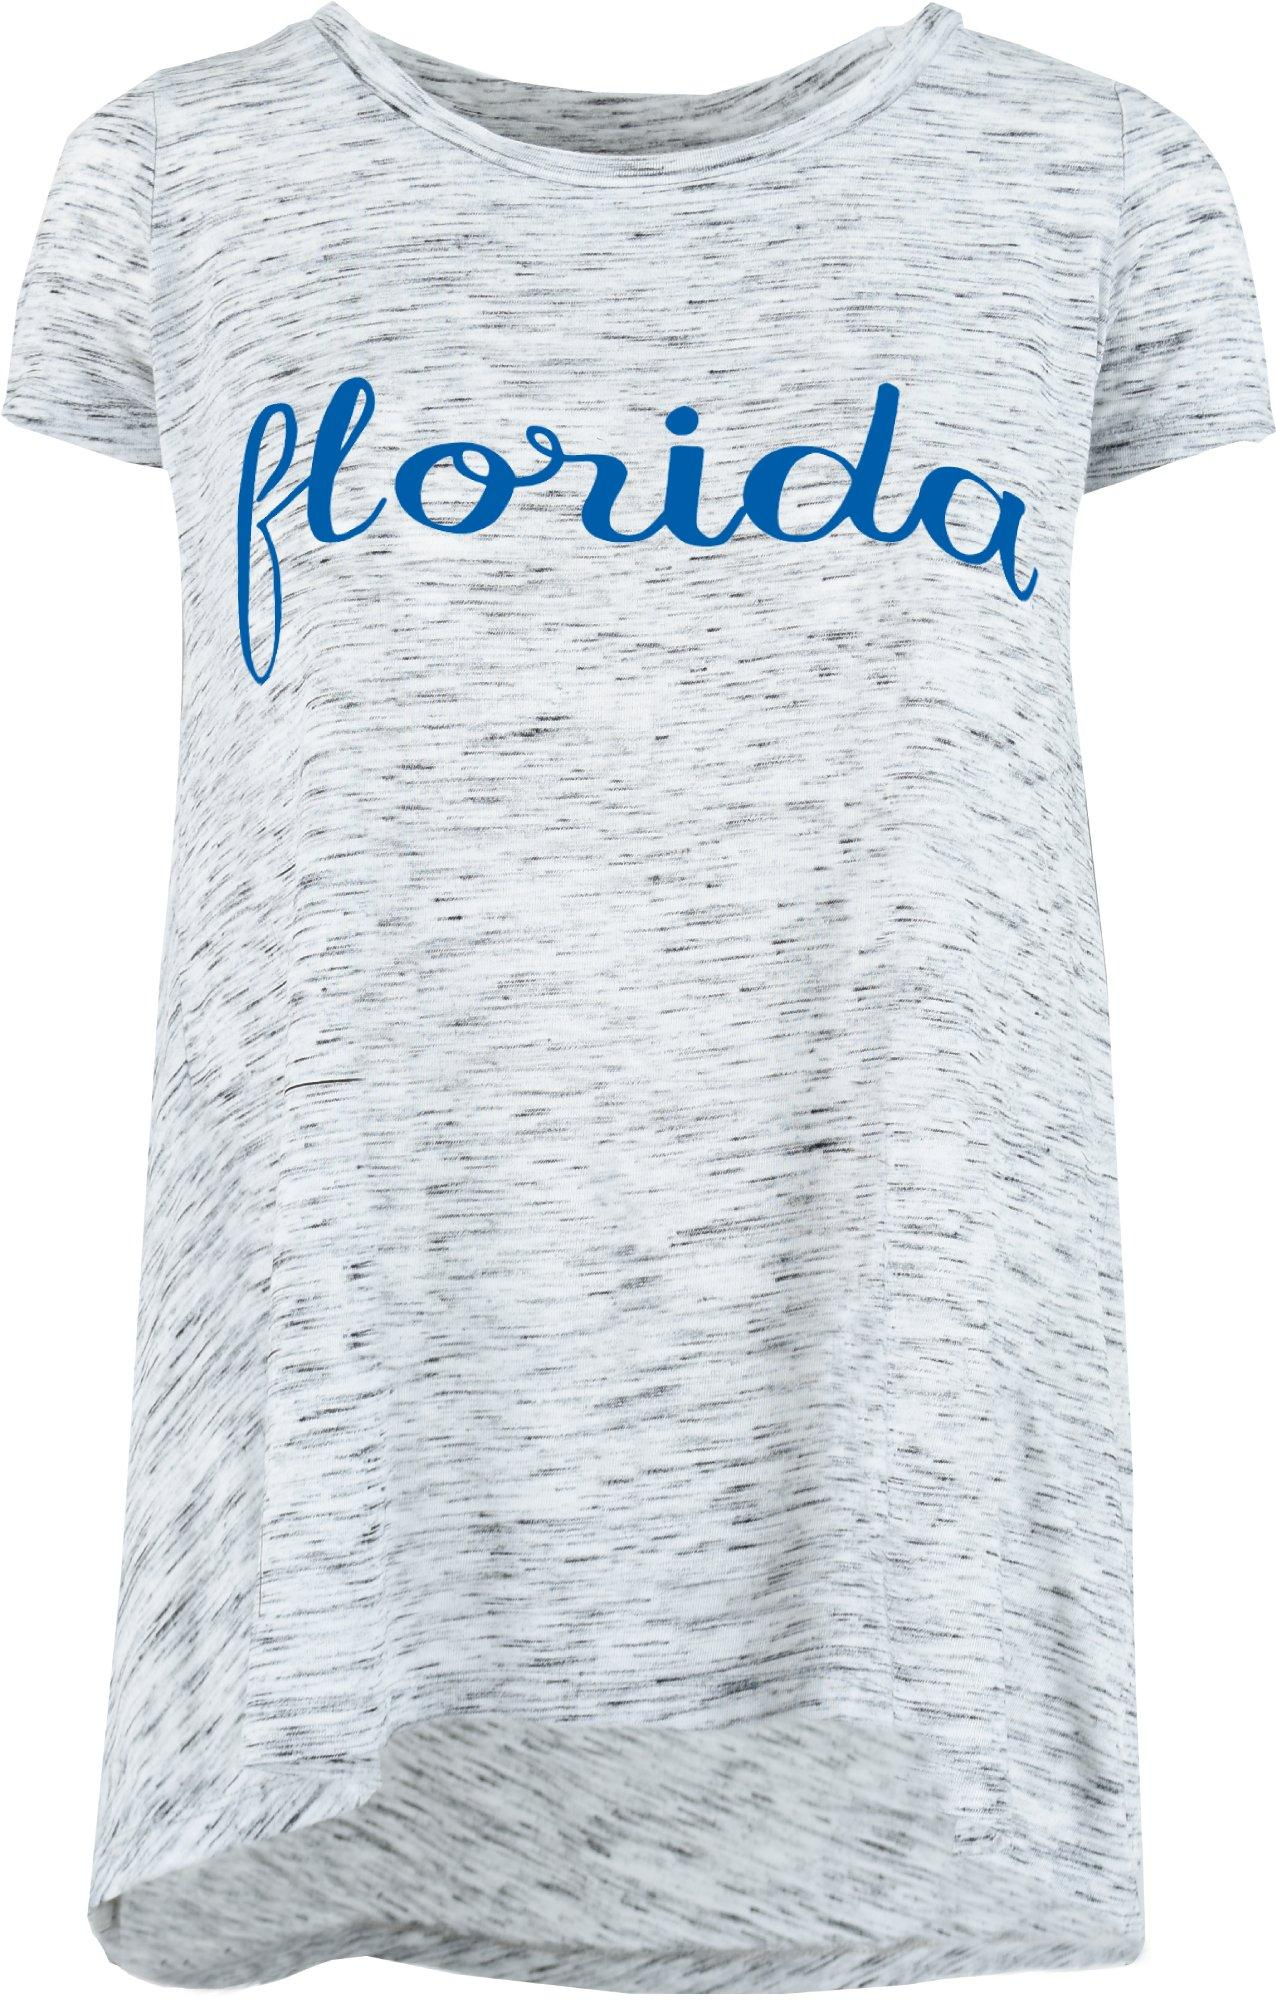 NWT FLORIDA GATOR SZ 2T WHITE T SHIRT FLORIDA GIRL FLOWERS SO CUTE!!